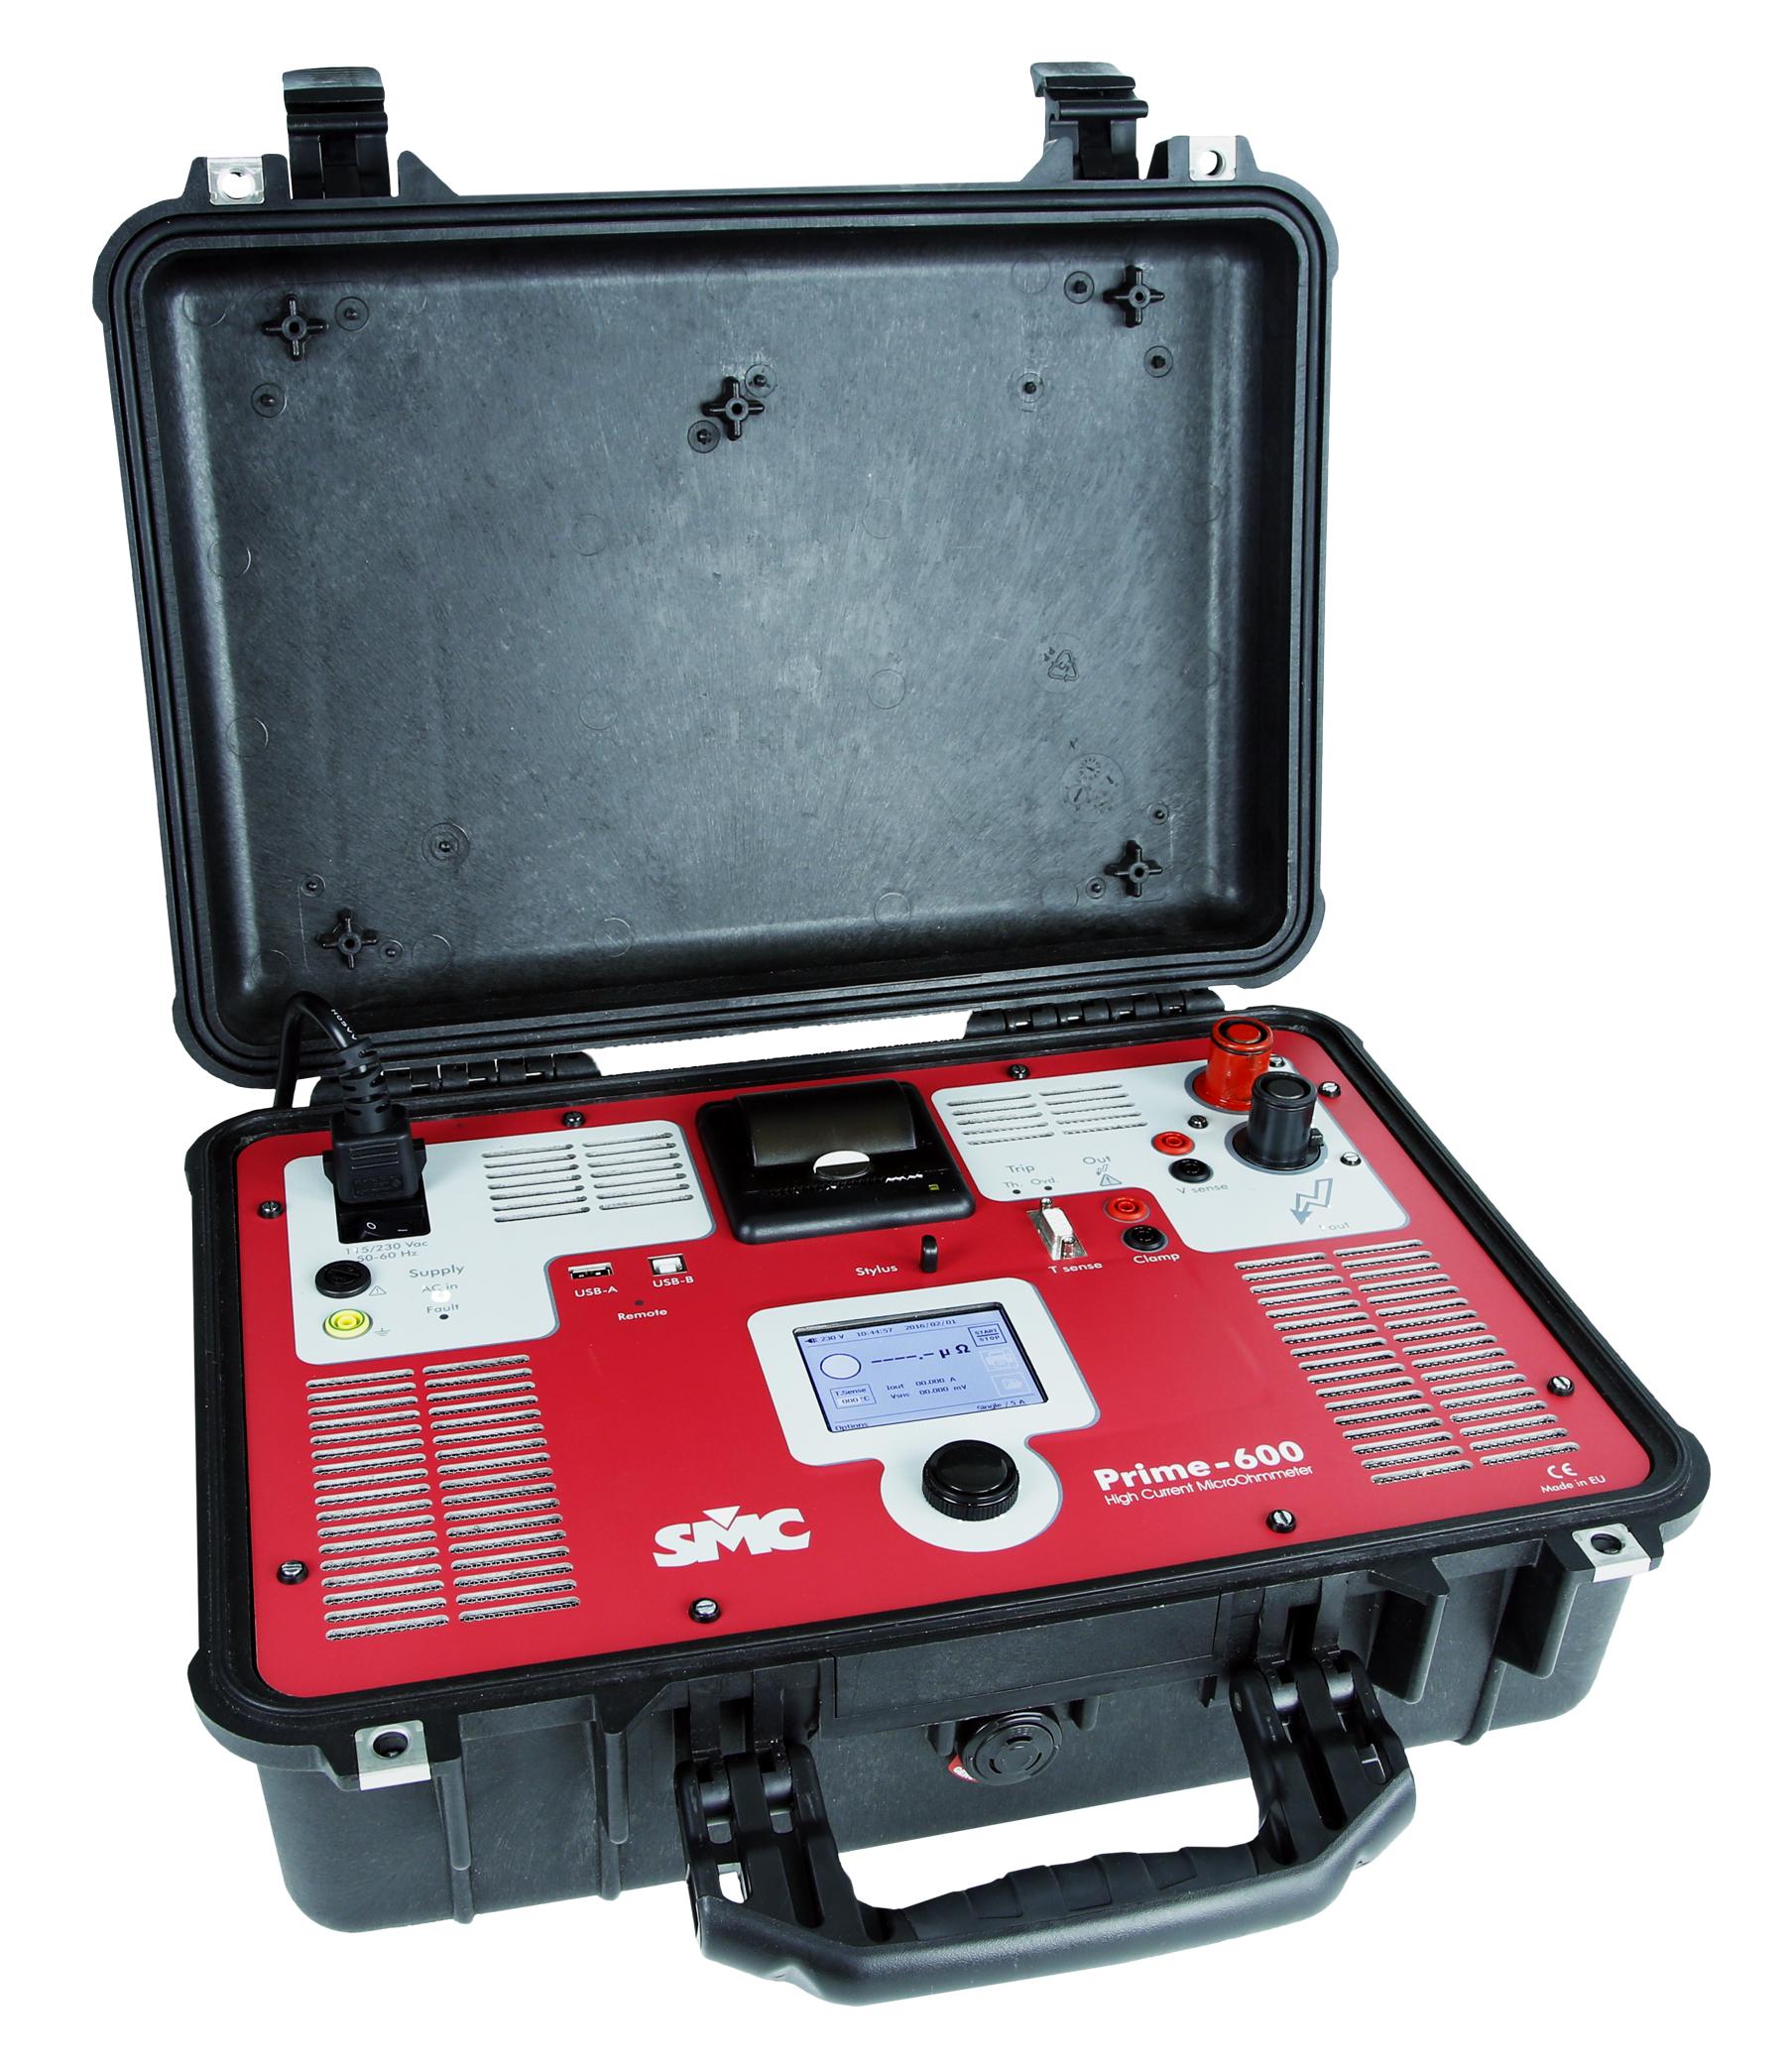 Prime 600 DRM Micro Ohm meter